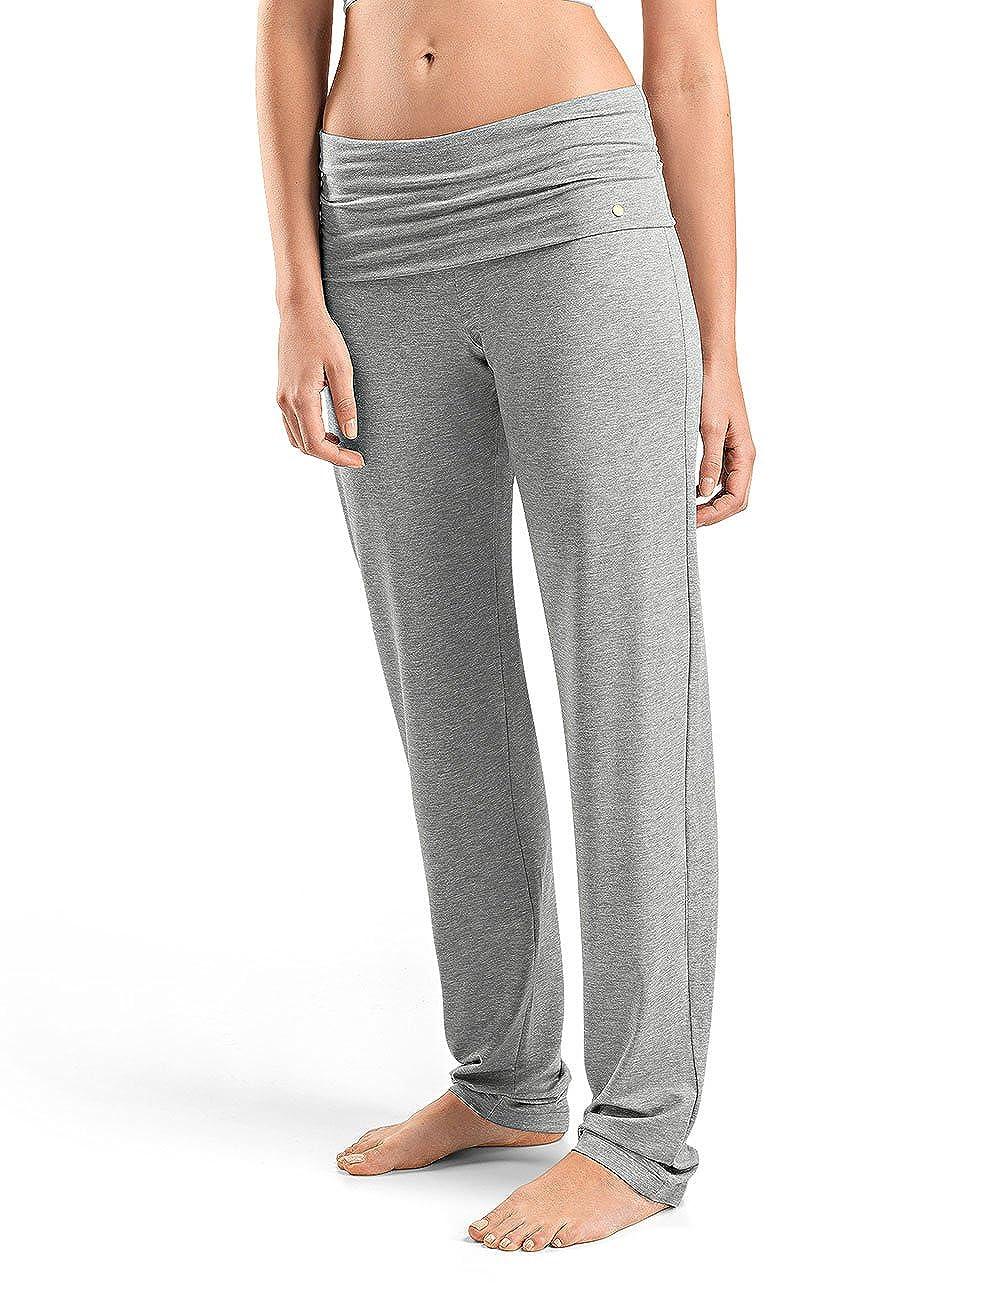 Hanro Yoga Hose Pantalones Deportivos para Mujer